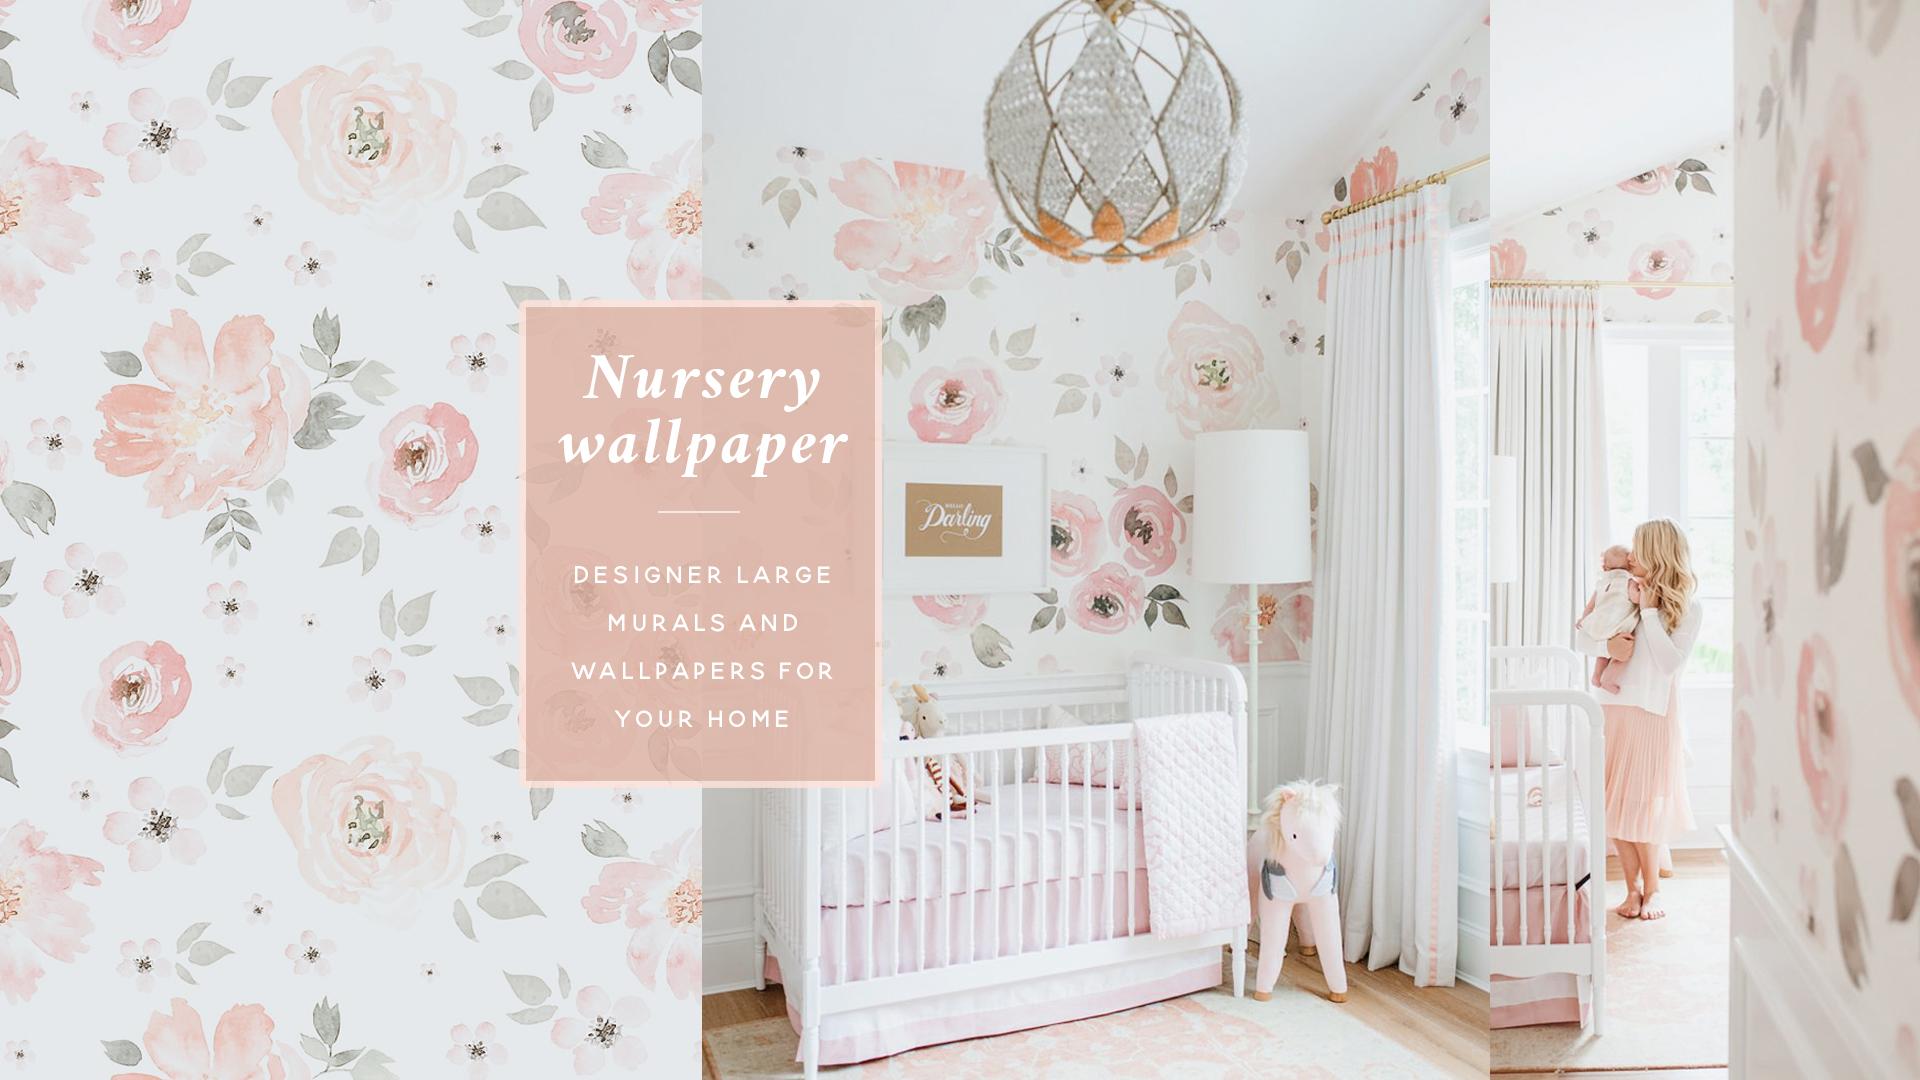 Praise Wedding and Family Online Store Nursery Wallpaper